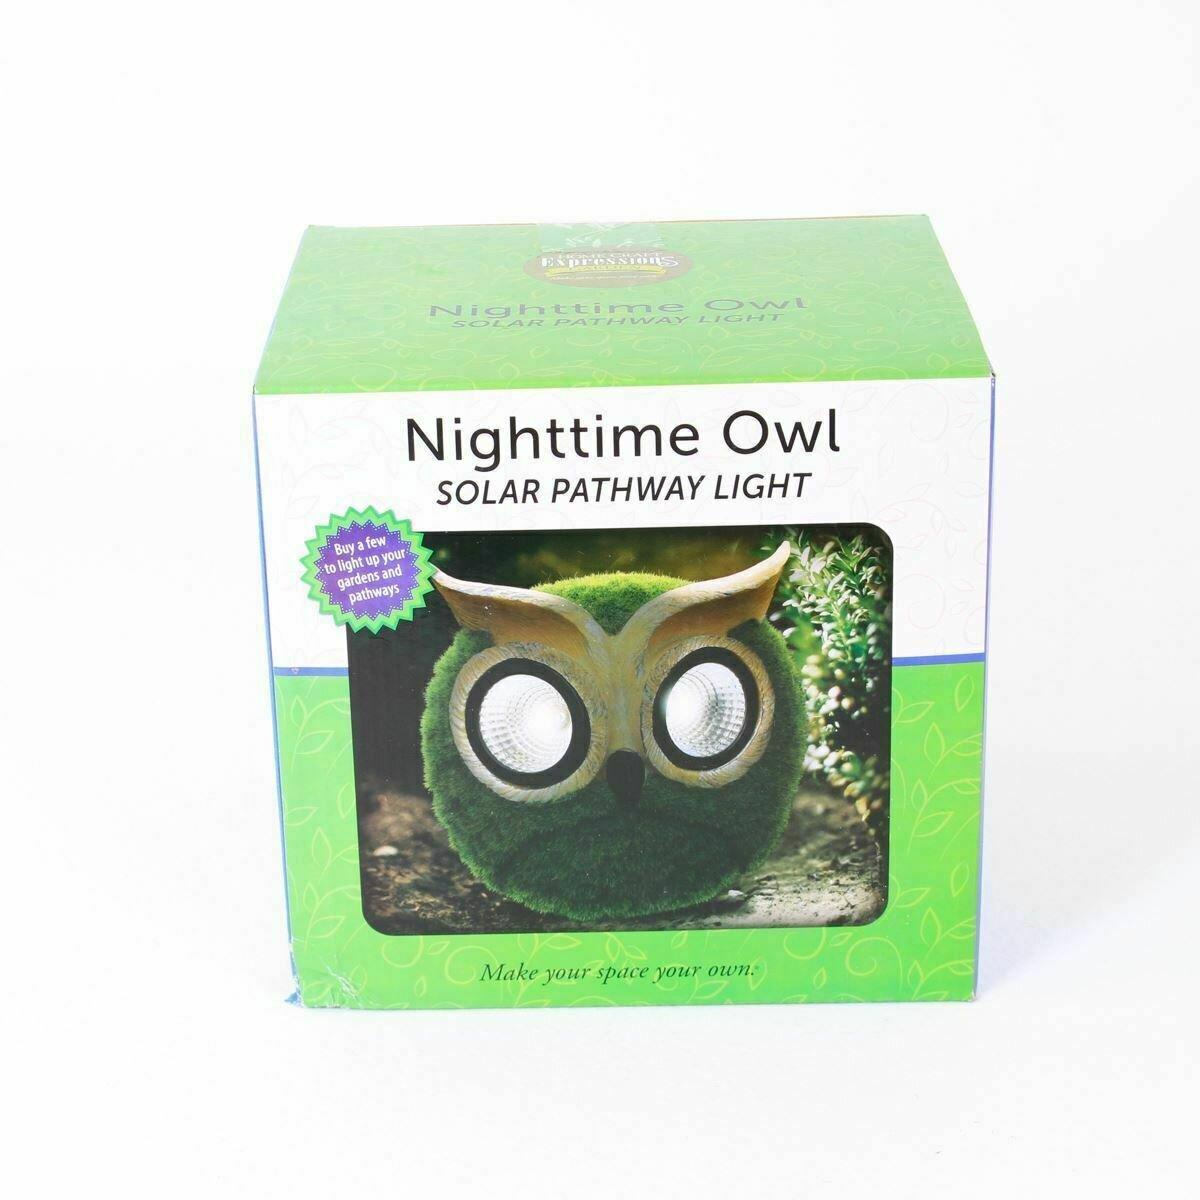 Nighttime Owl Solar Pathway Light